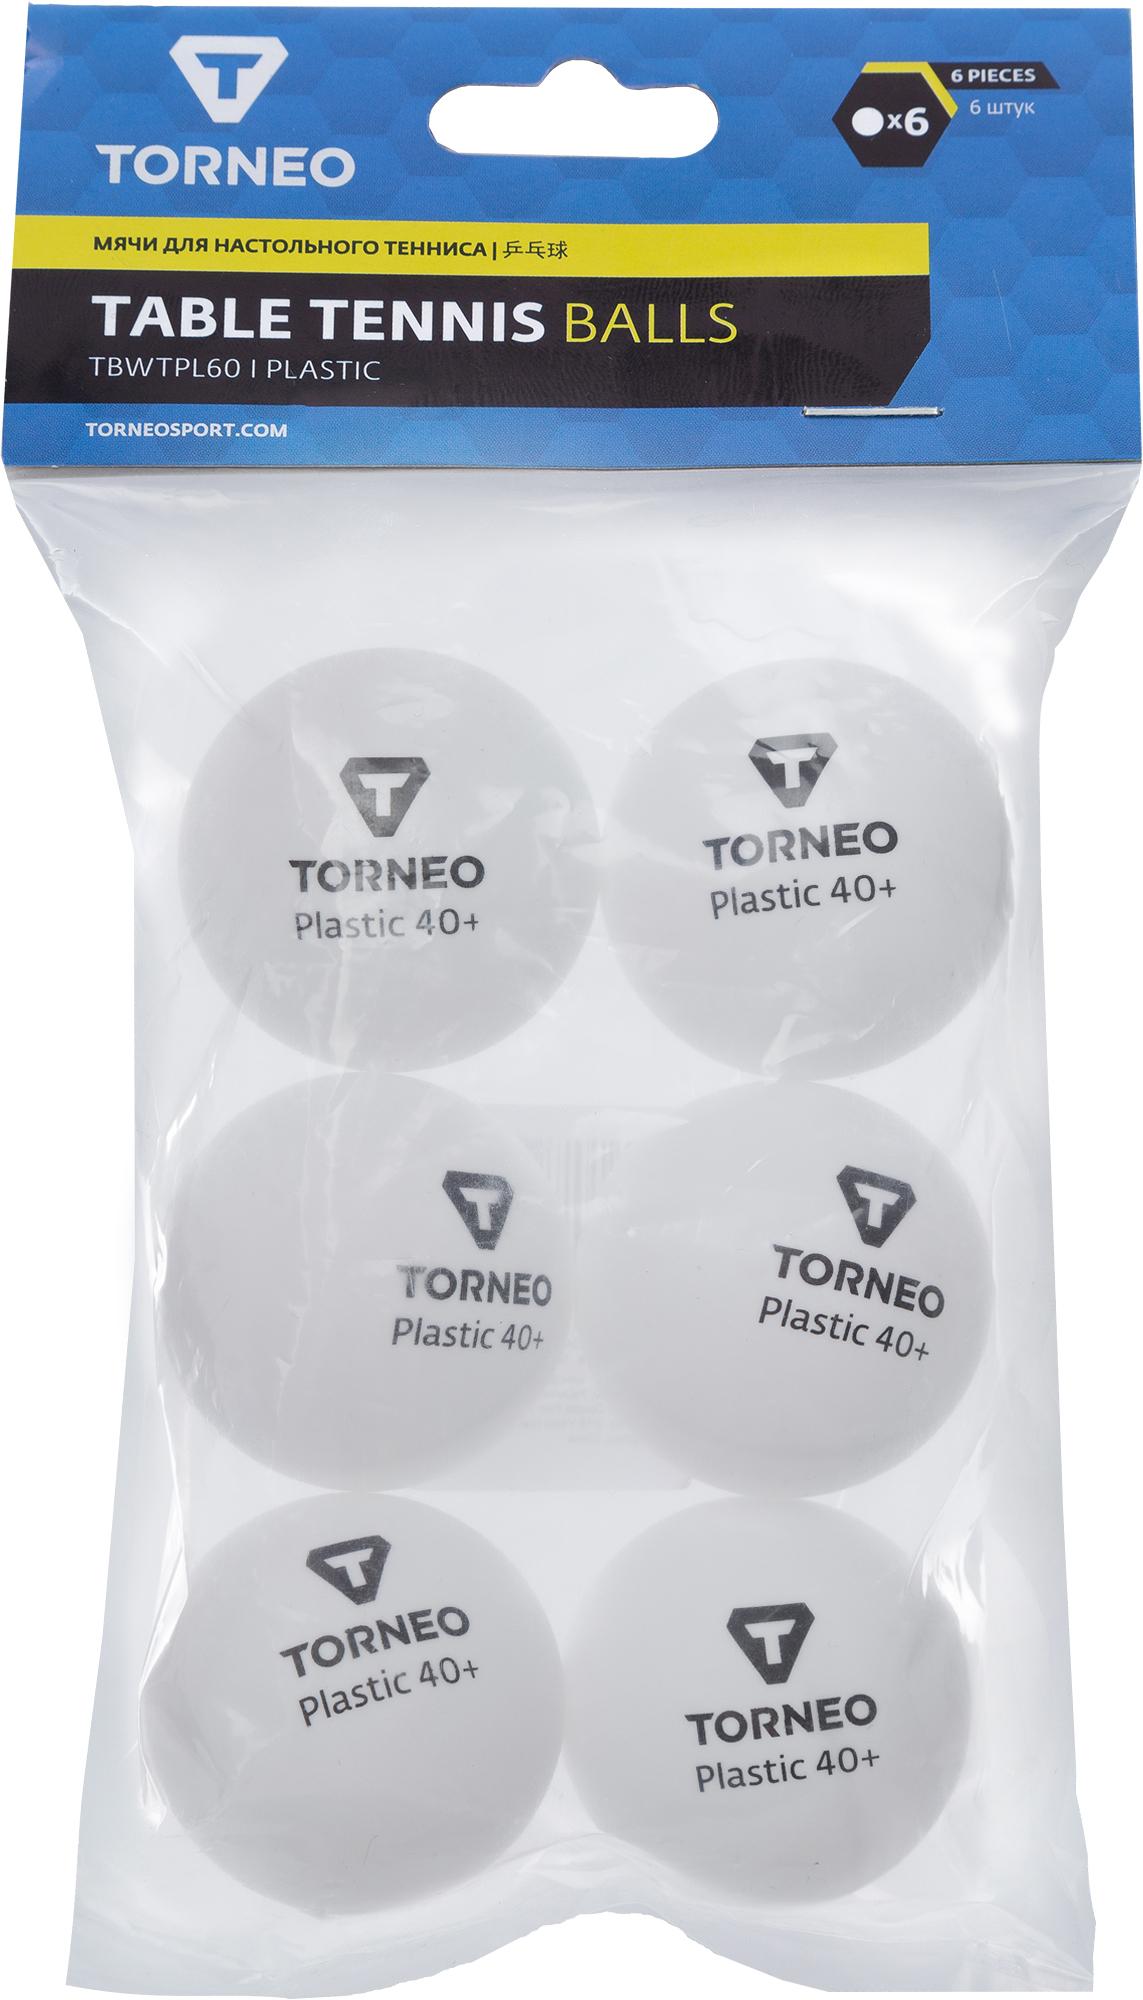 Torneo Набор мячей для настольного тенниса Torneo, 6 шт цена